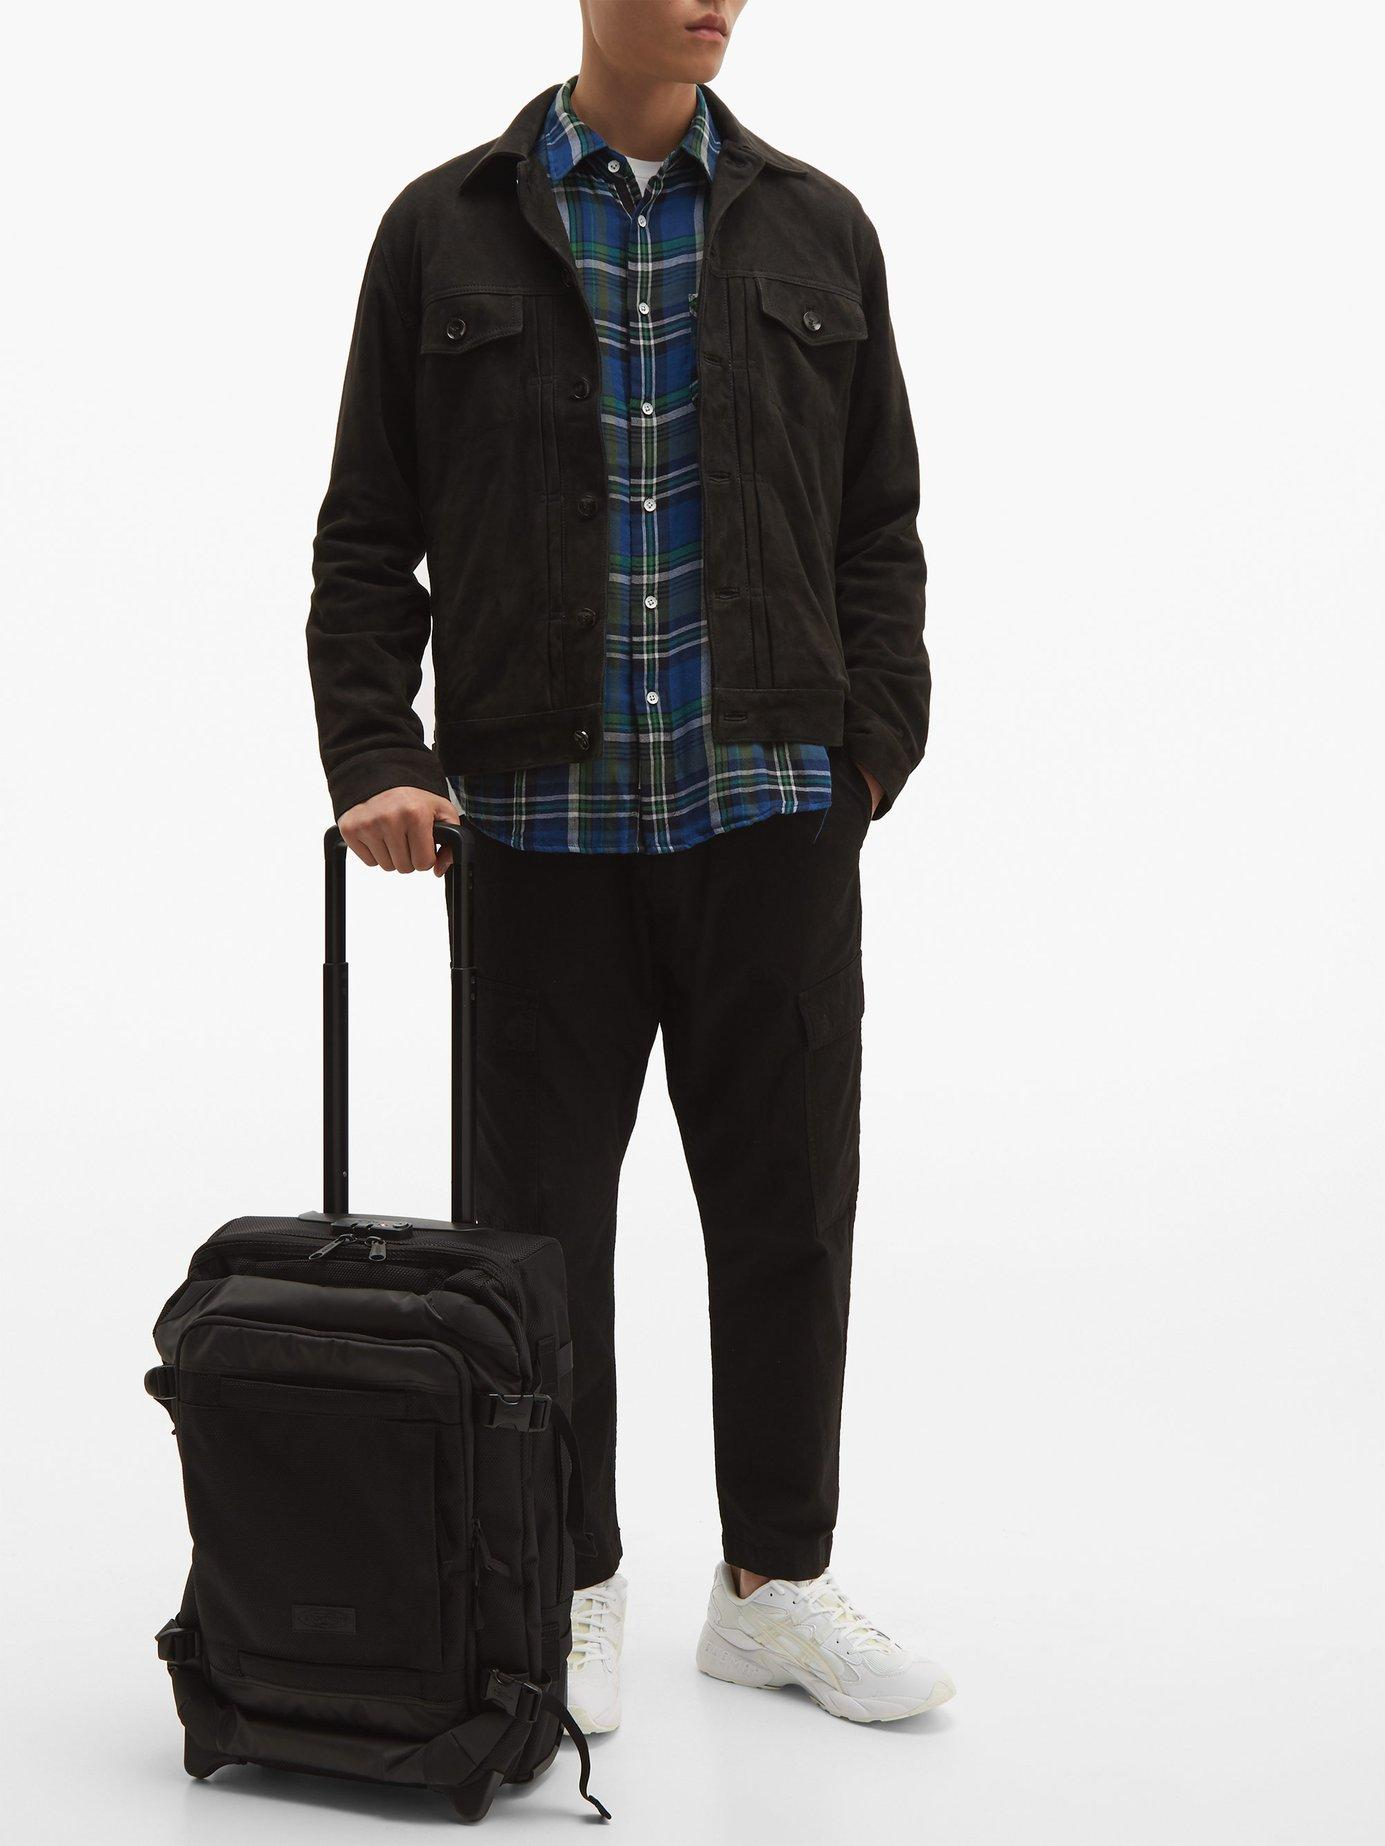 dfd7a8705 Eastpak Tranverz Cnnct Coat Carry On Suitcase in Black for Men - Lyst